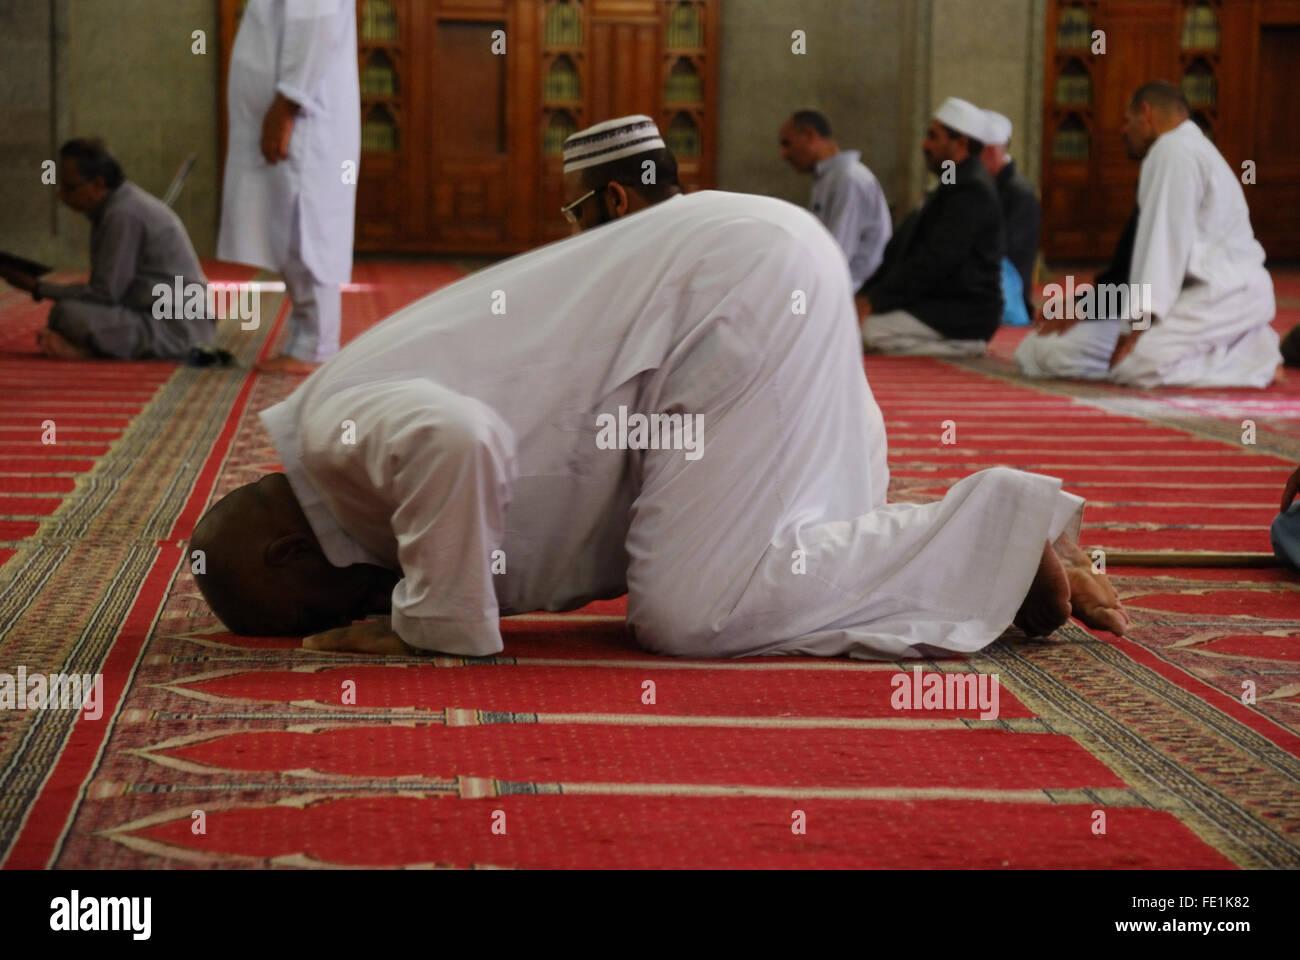 Man prostrating inside Masjid Quba, the very first Mosque that was built, Medina, Saudi Arabia - Stock Image